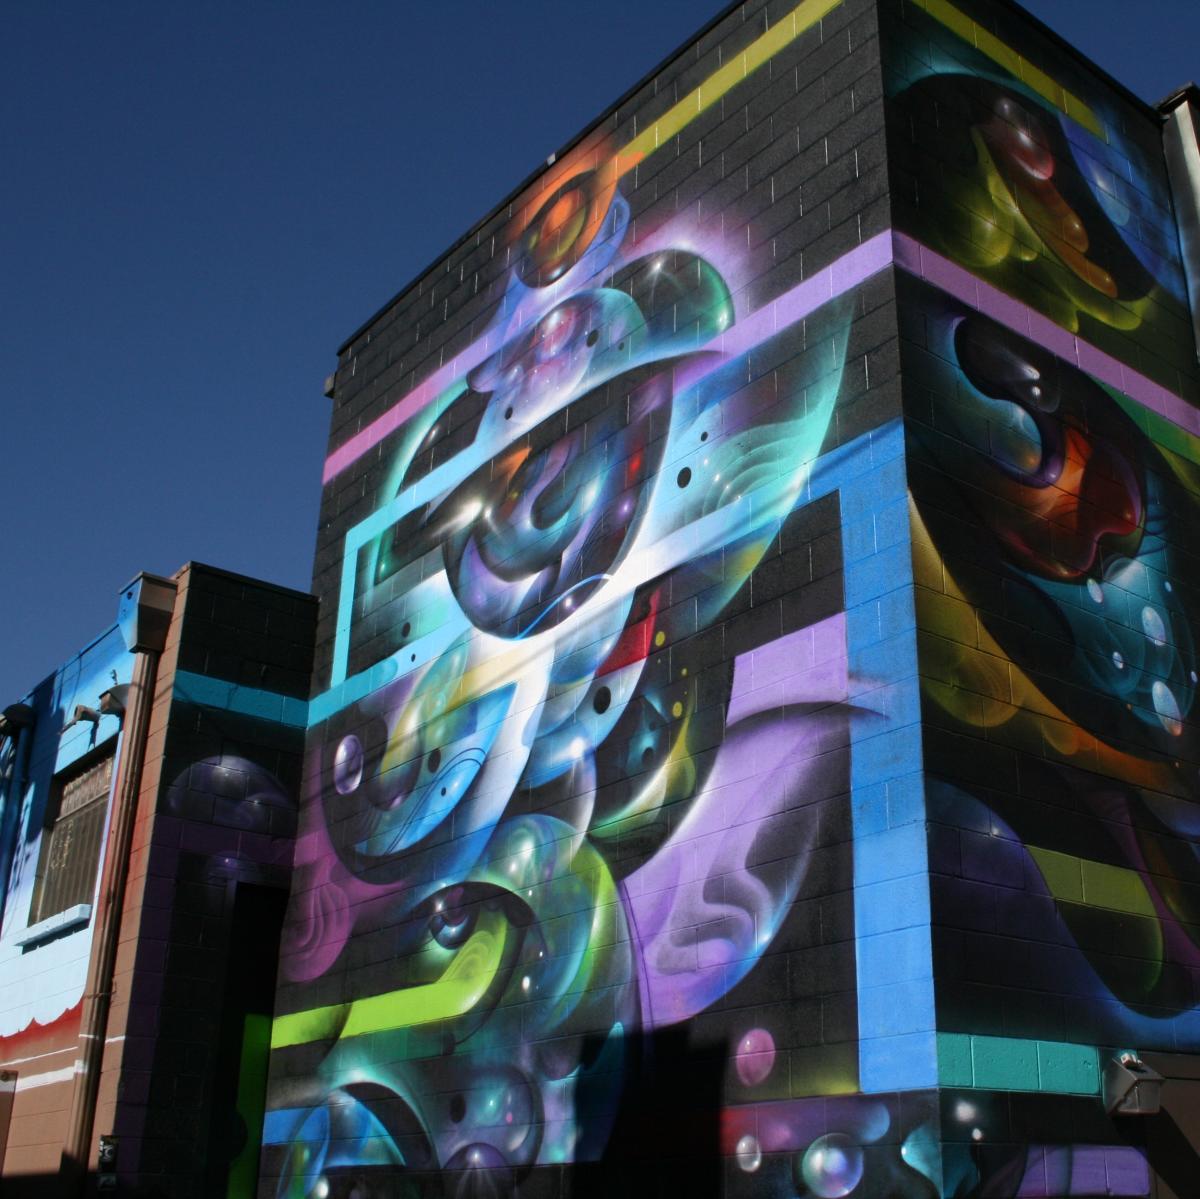 Street art in Denver's River North Art District.